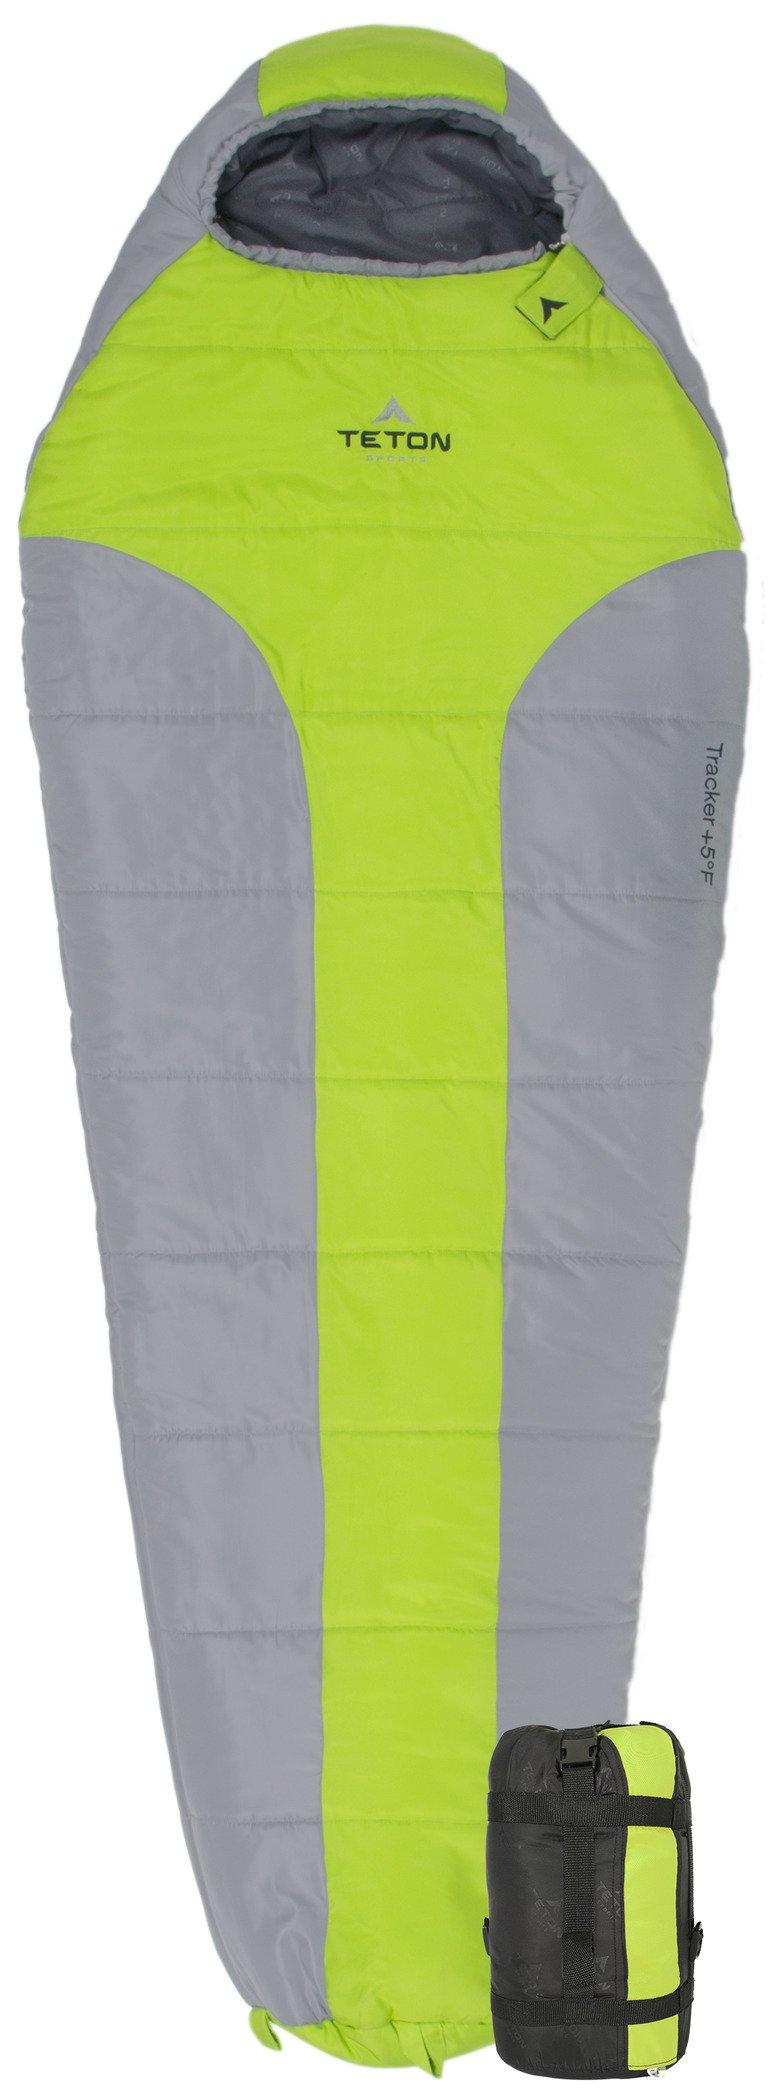 TETON Sports Tracker Scout Ultralight Mummy Sleeping Bag; Lightweight Backpacking Sleeping Bag for Hiking and Camping Outdoors; All Season Mummy Bag; Sleep Comfortably Anywhere; Green/Grey